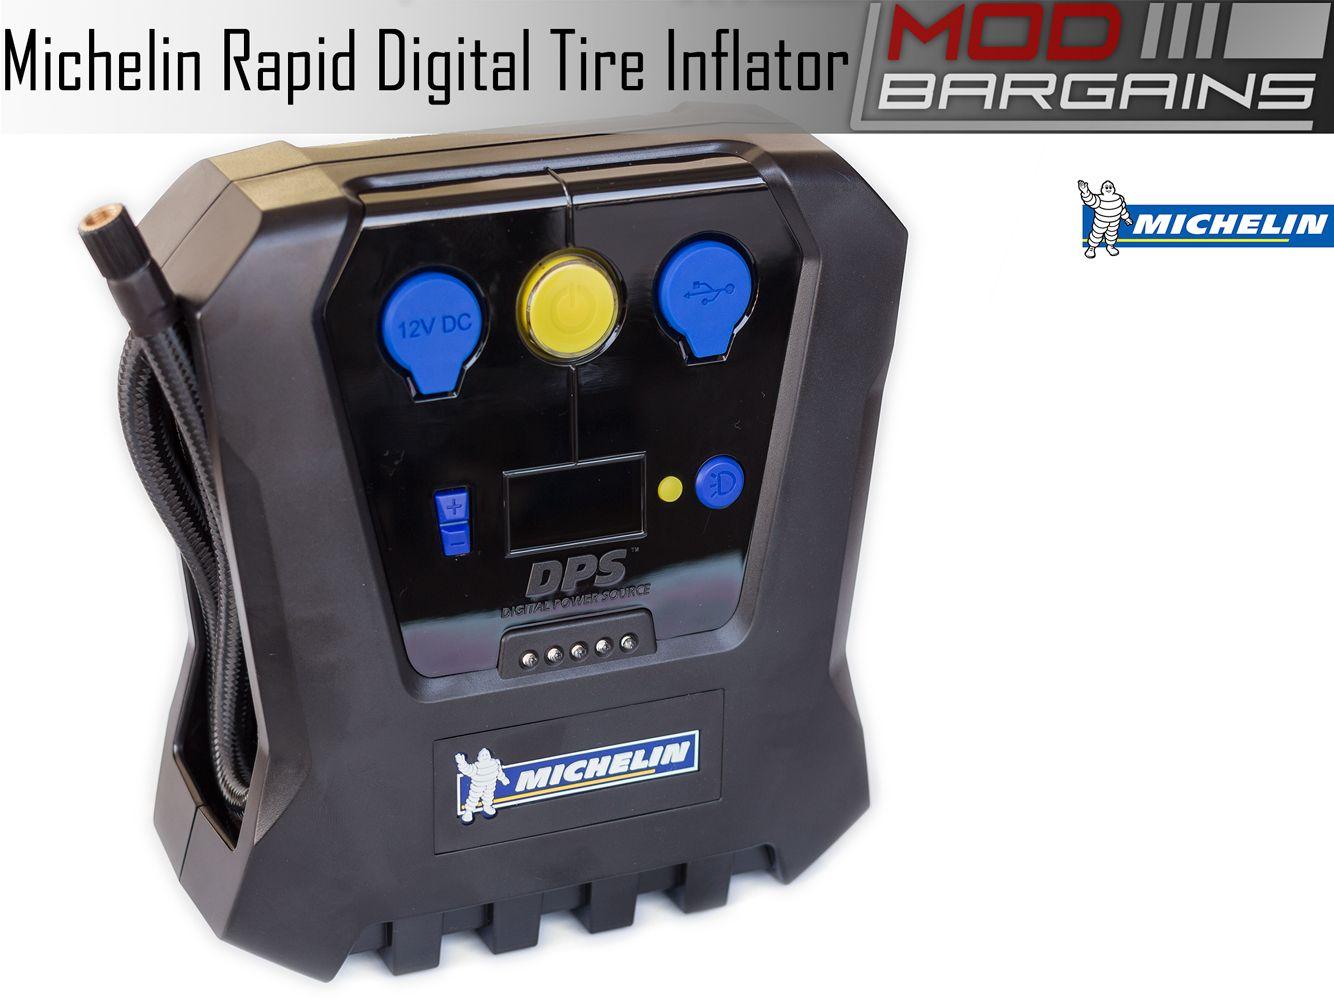 Michelin High Power 12 Volt Rapid Digital Tire Inflator 12266